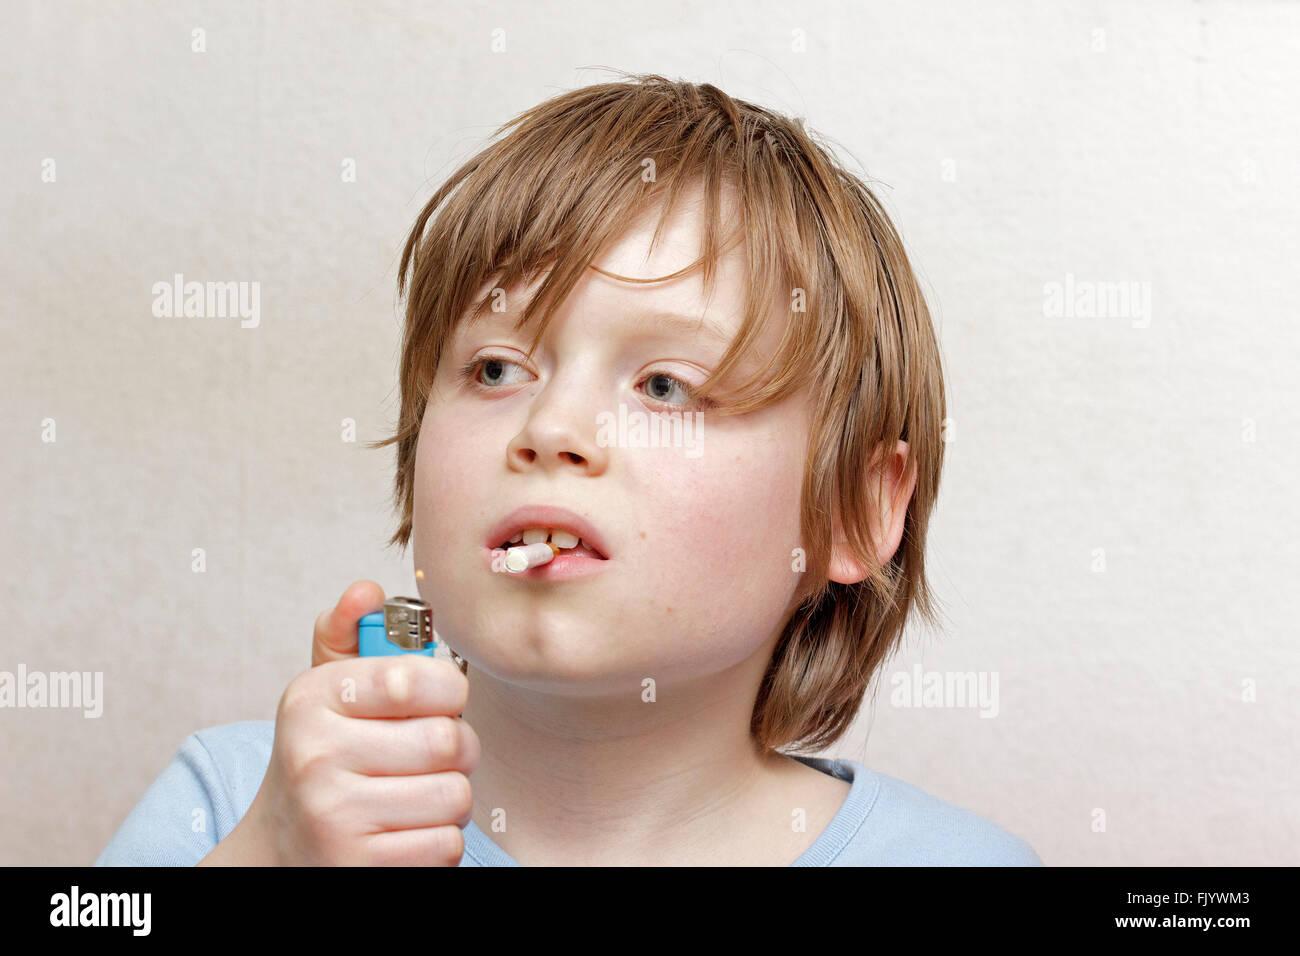 underage smoking Stock Photo - underage boy smoking